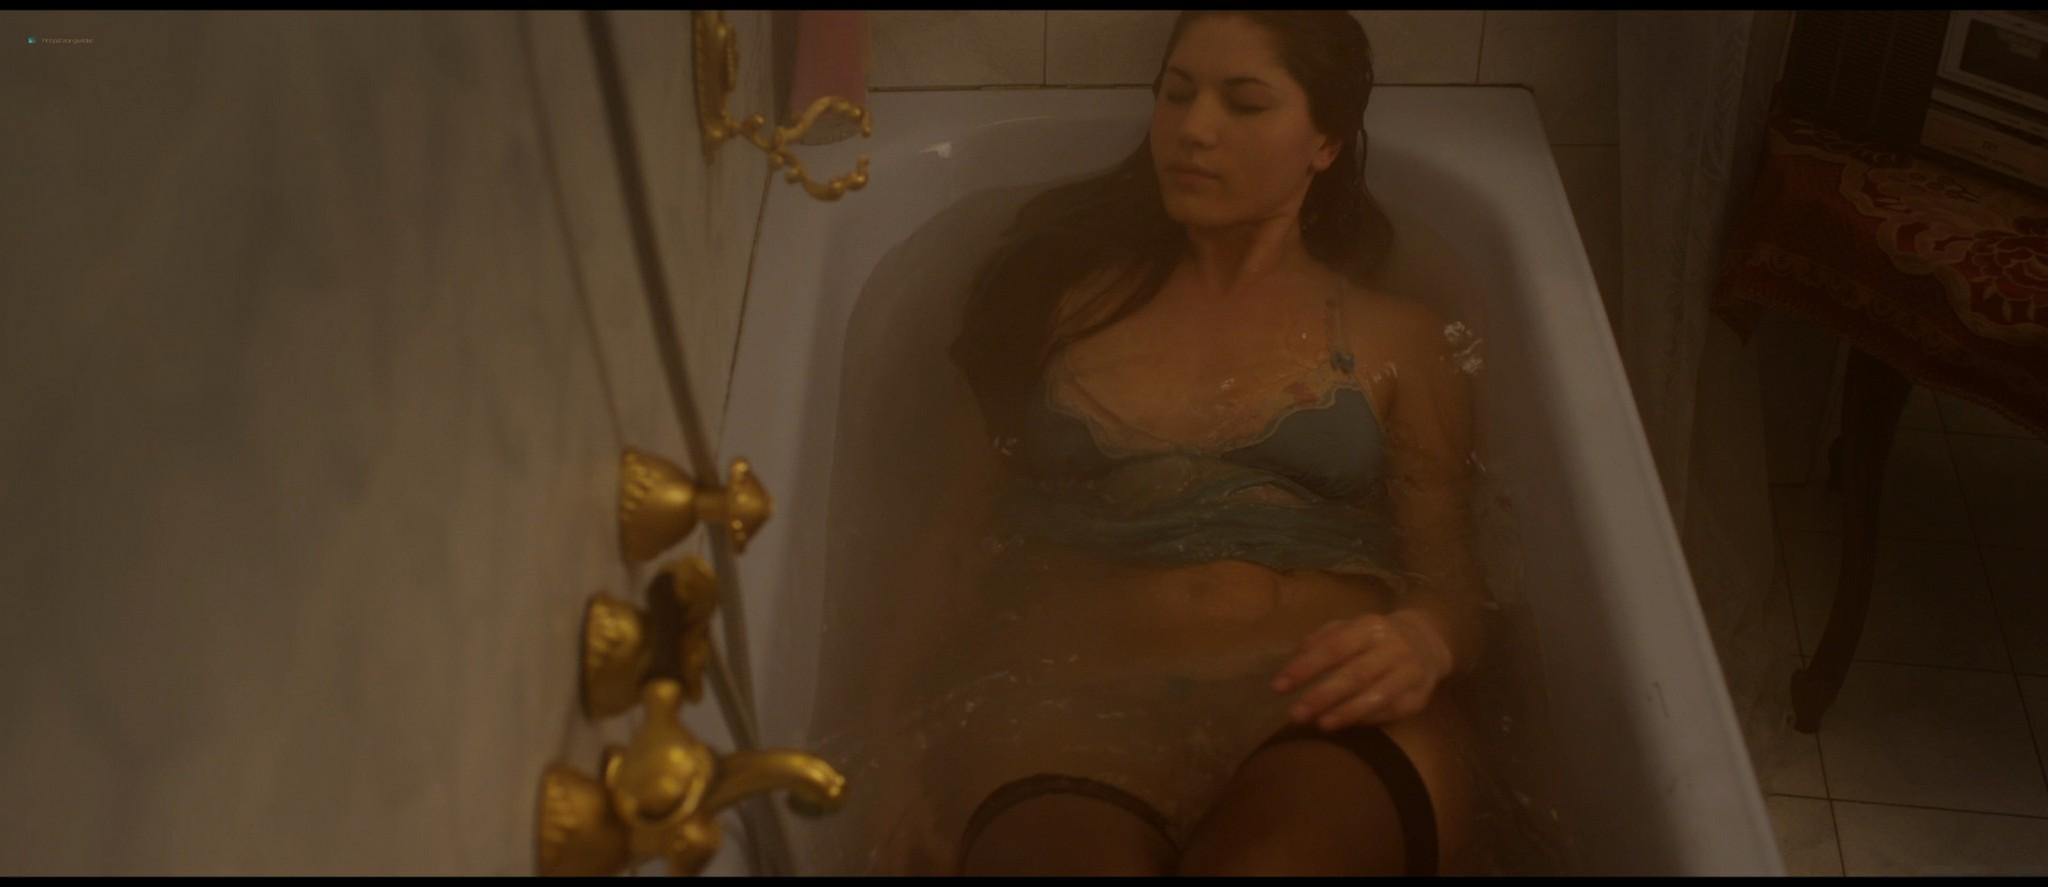 Elena Mirela nude Grazia Leone, Denny Méndez nude too - Blood Trap (2016) HD 1080p BluRay (11)